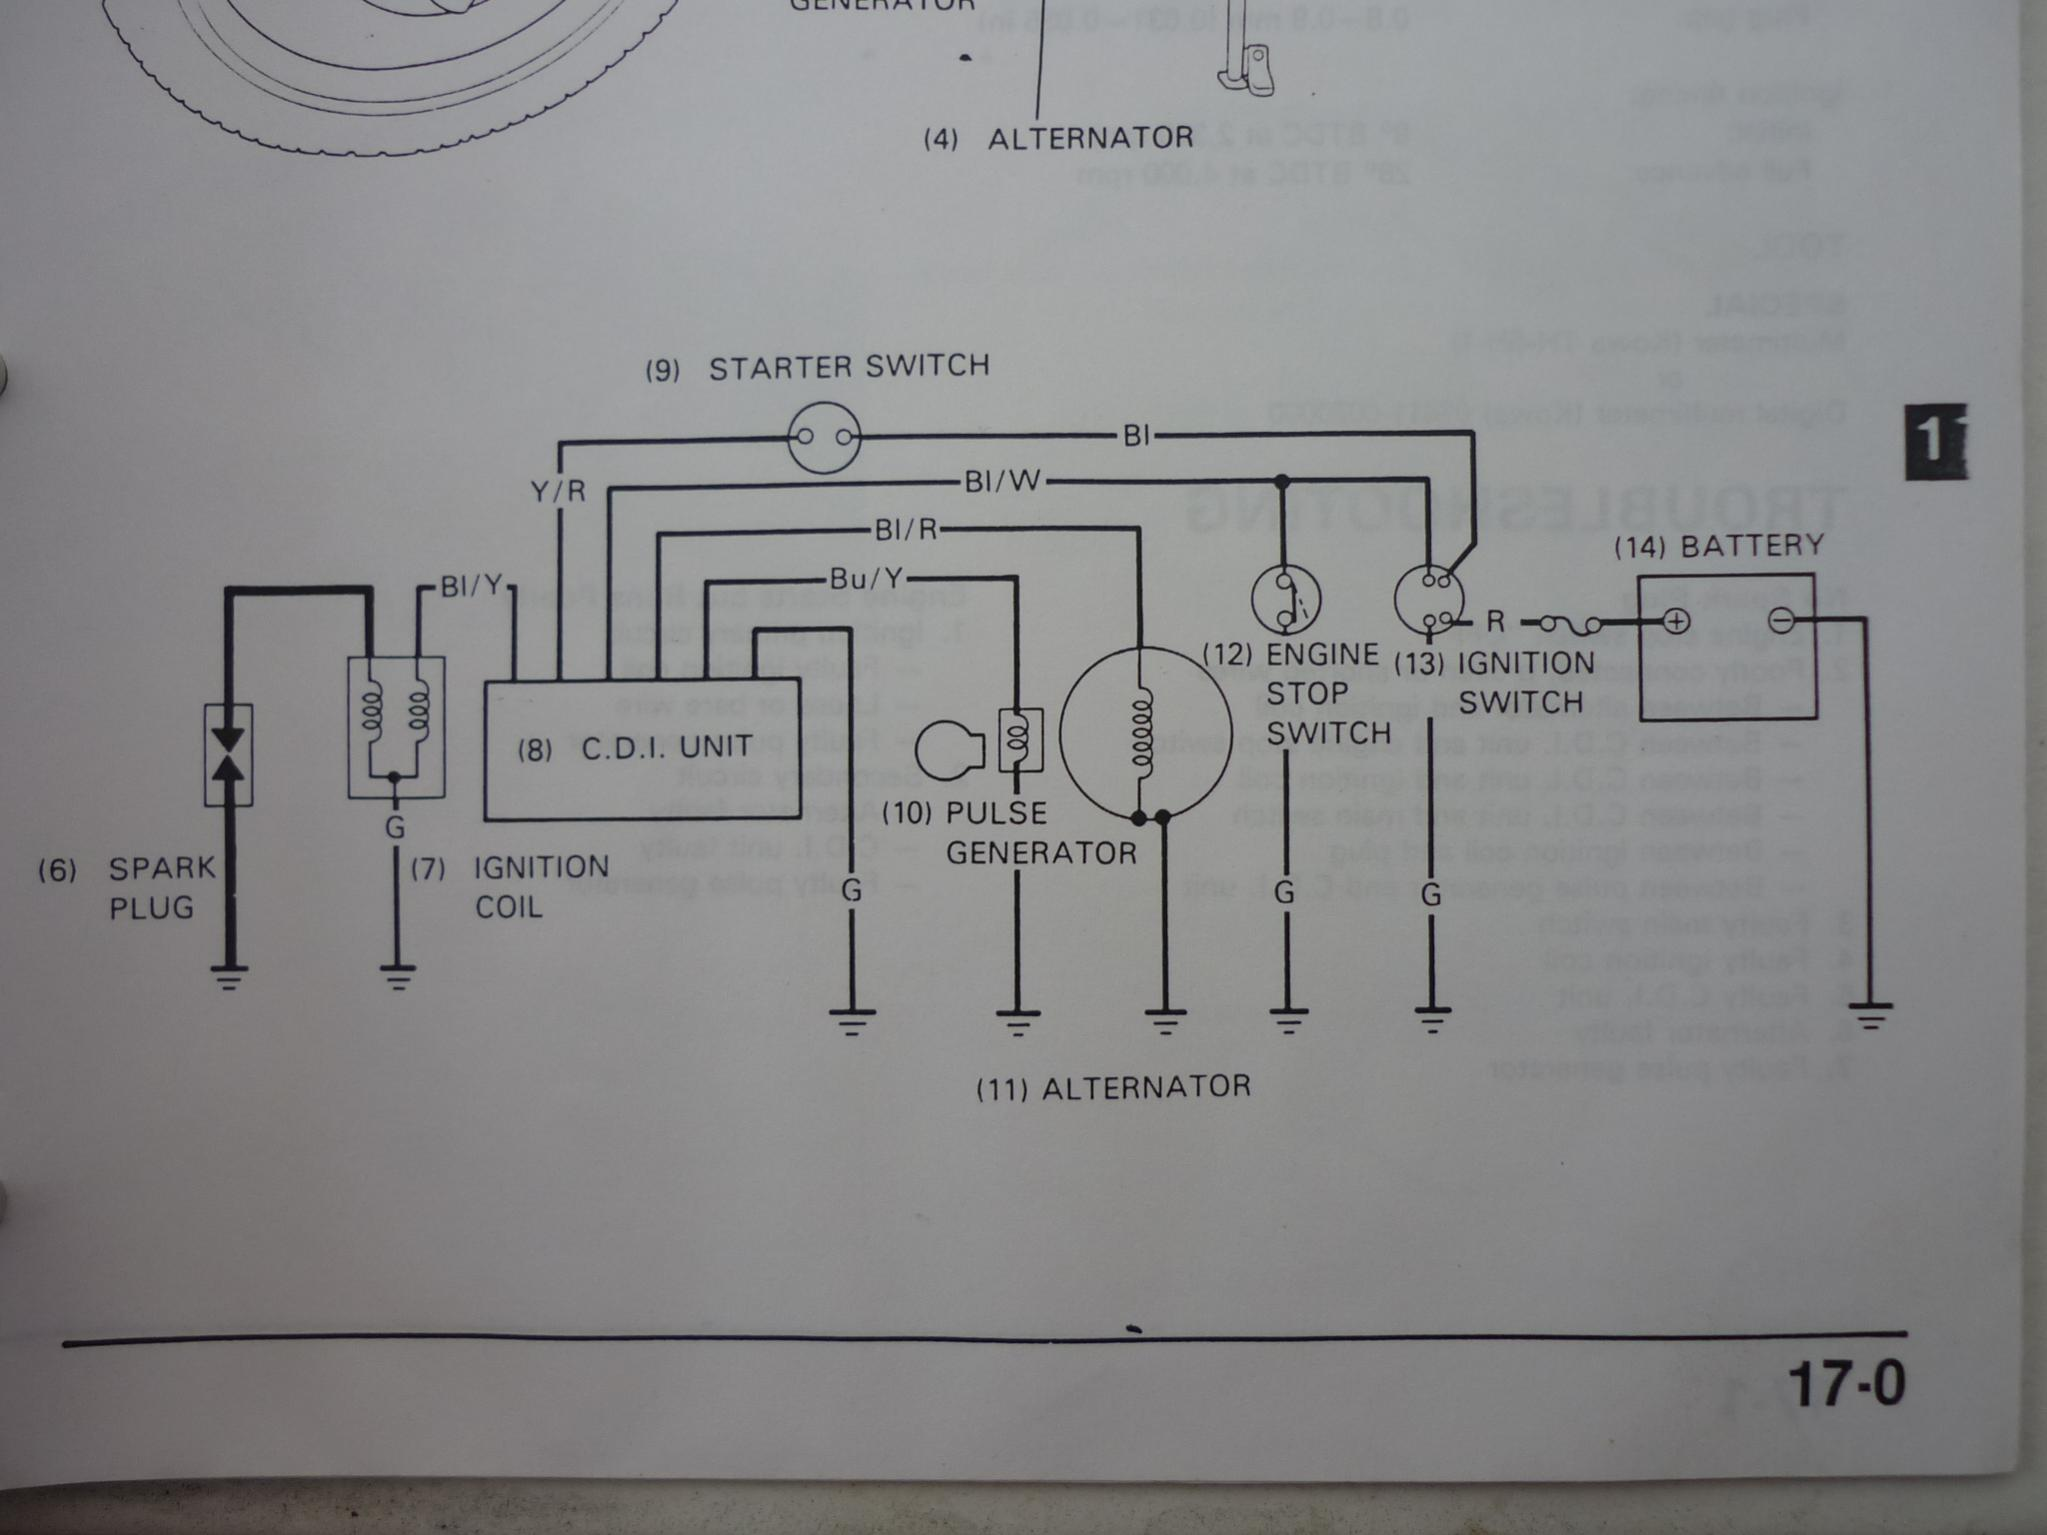 xl600 lmf wiring diagram page 2 p1010573 jpg views 3827 size 158 5 kb